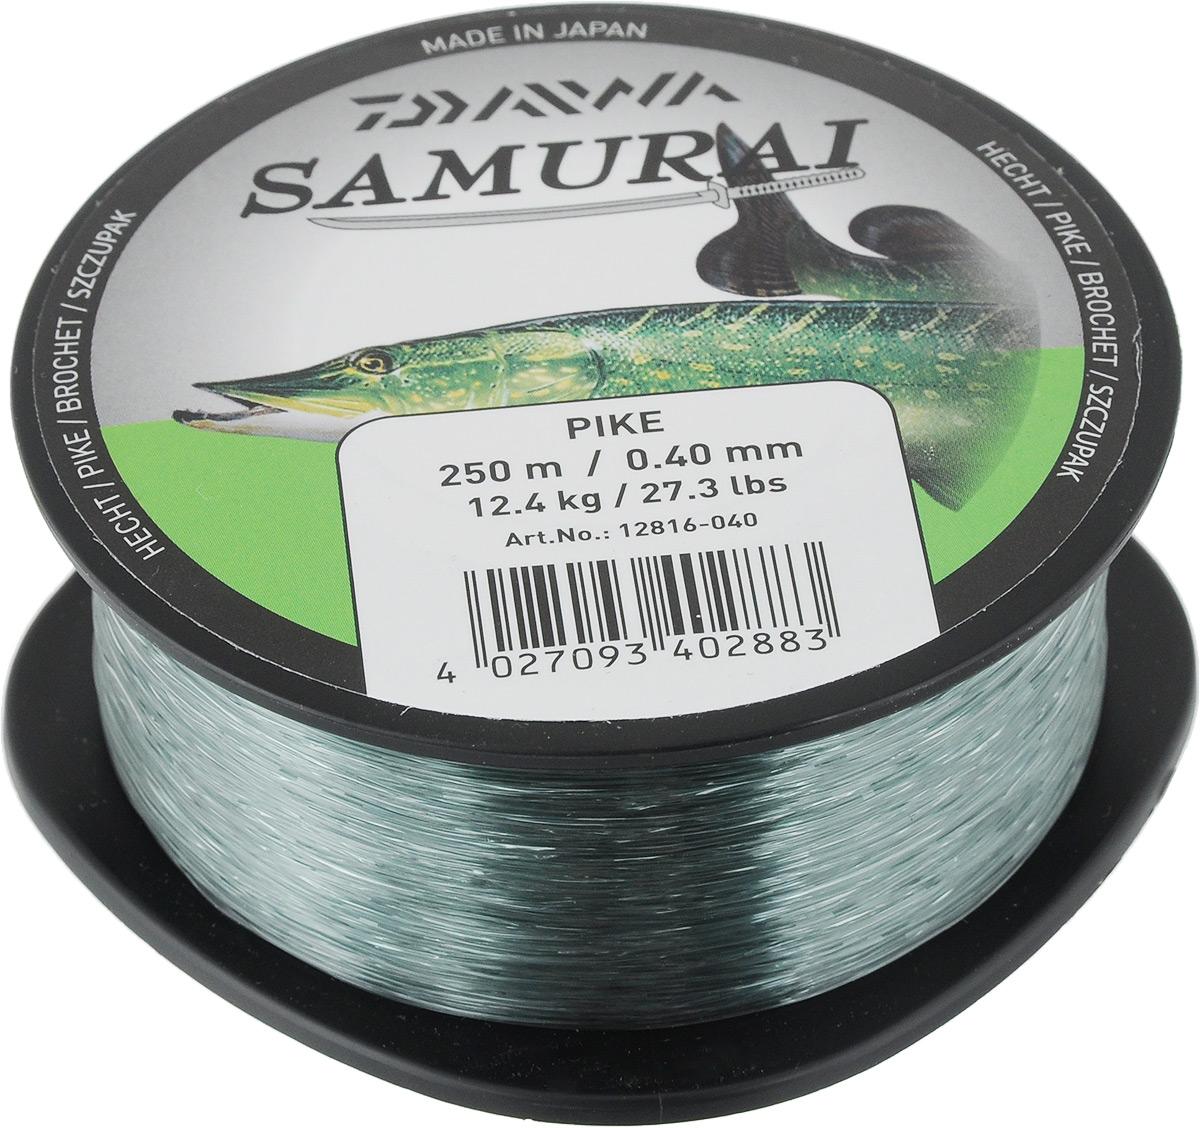 Леска Daiwa Samurai Pike, цвет: светло-оливковый, 250 м, 0,4 мм, 12,4 кг